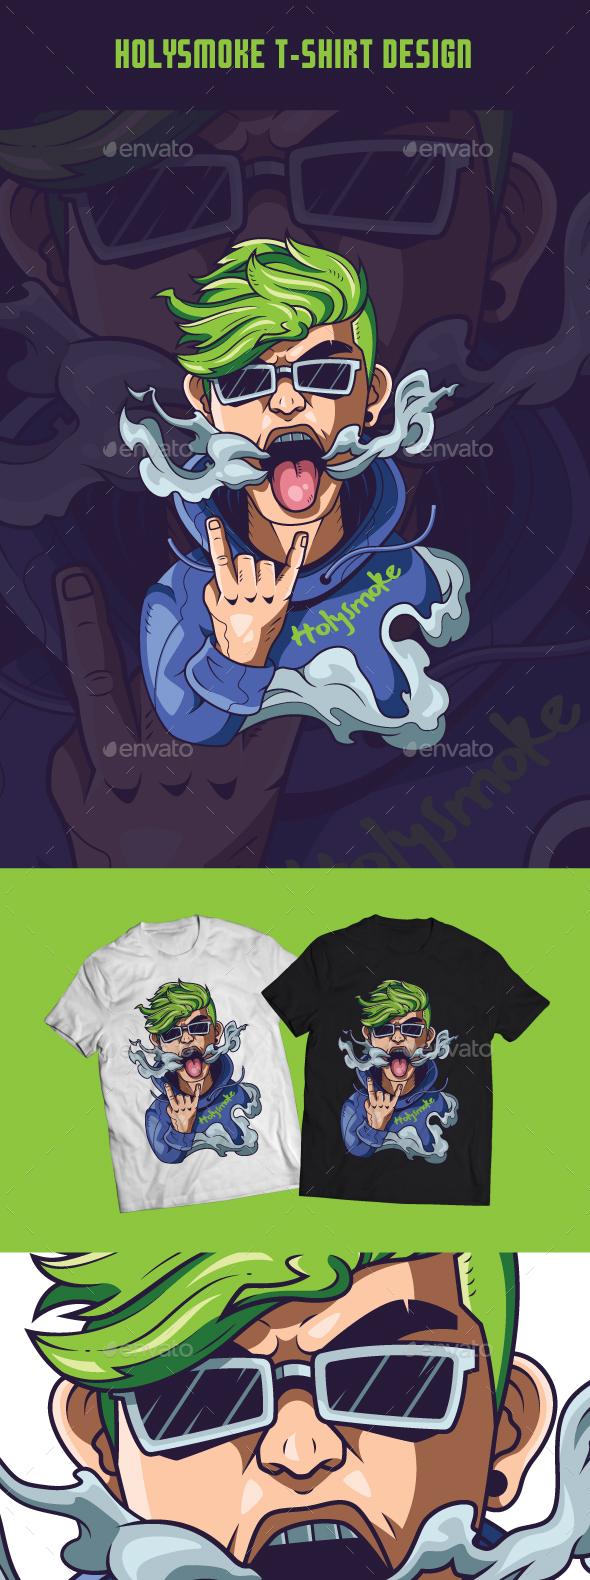 Holysmoke T-Shirt Design